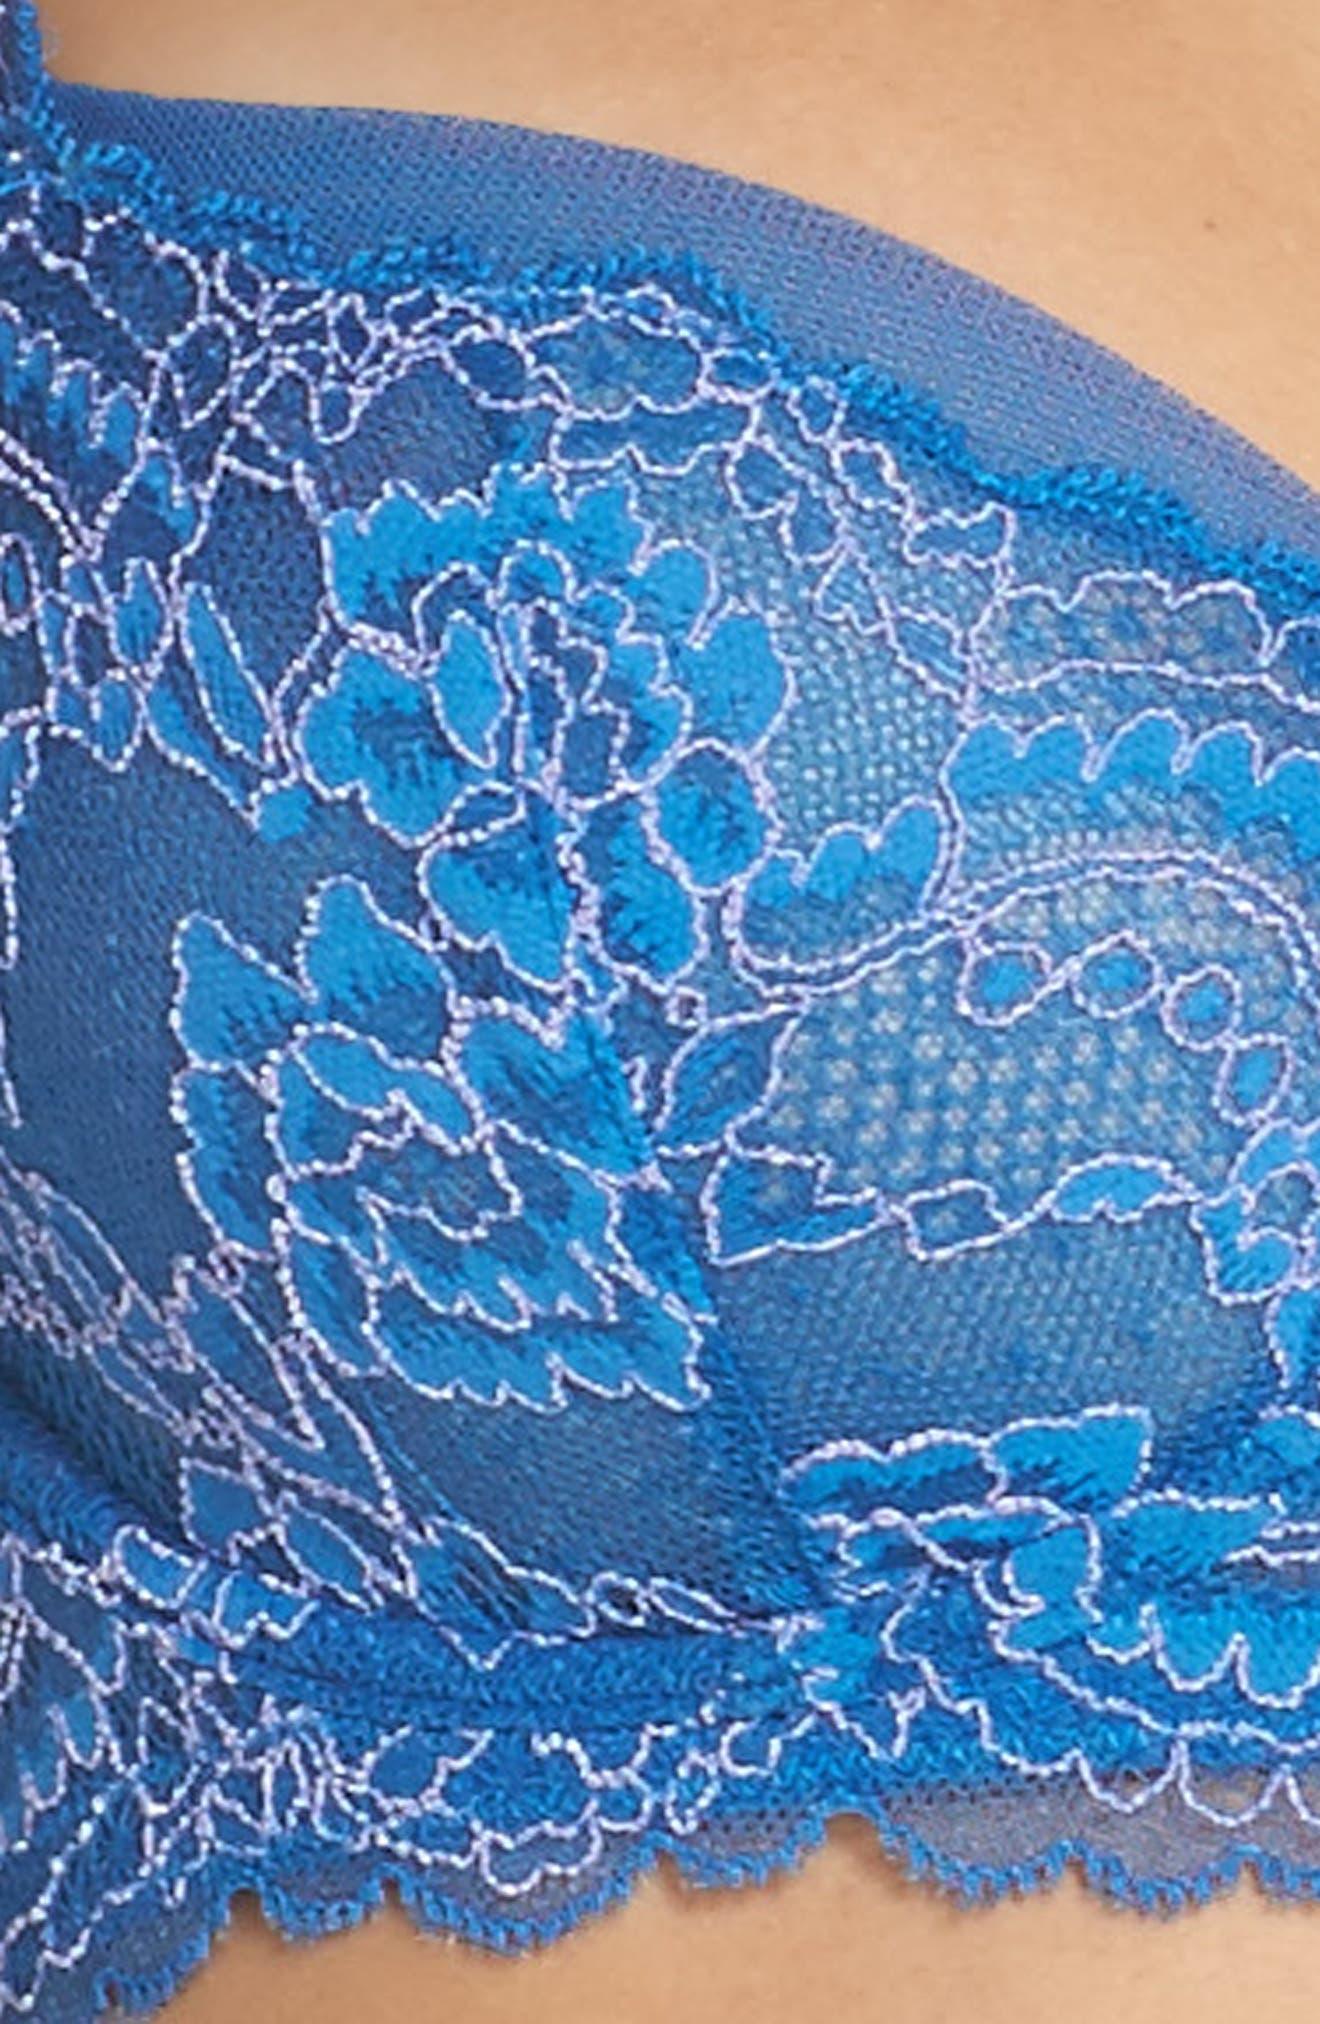 'Minx' Unlined Lace Demi Underwire Bra,                             Alternate thumbnail 70, color,